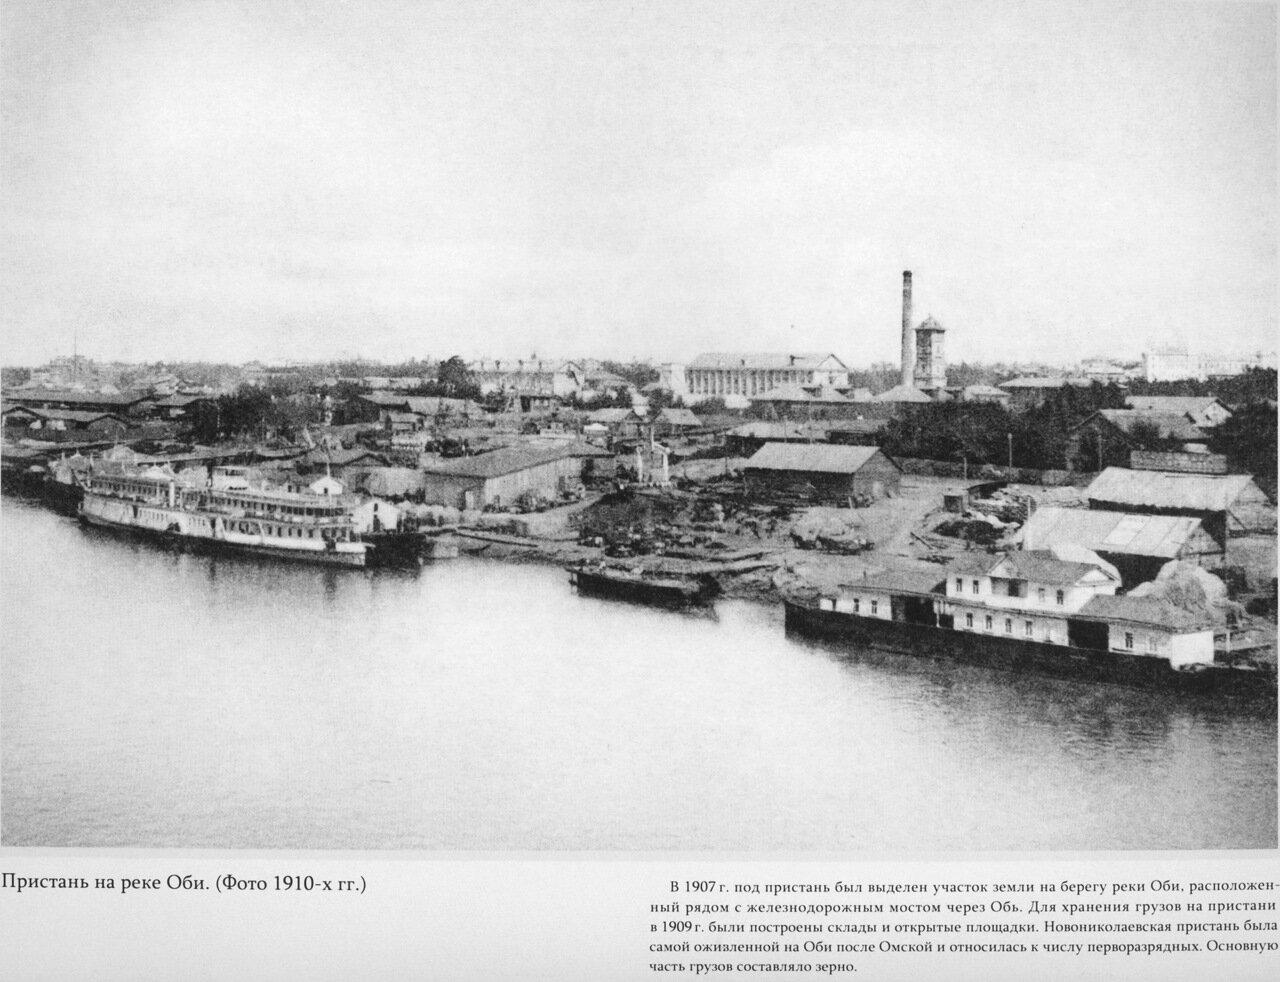 Пристань на реке Оби, 1910-е годы